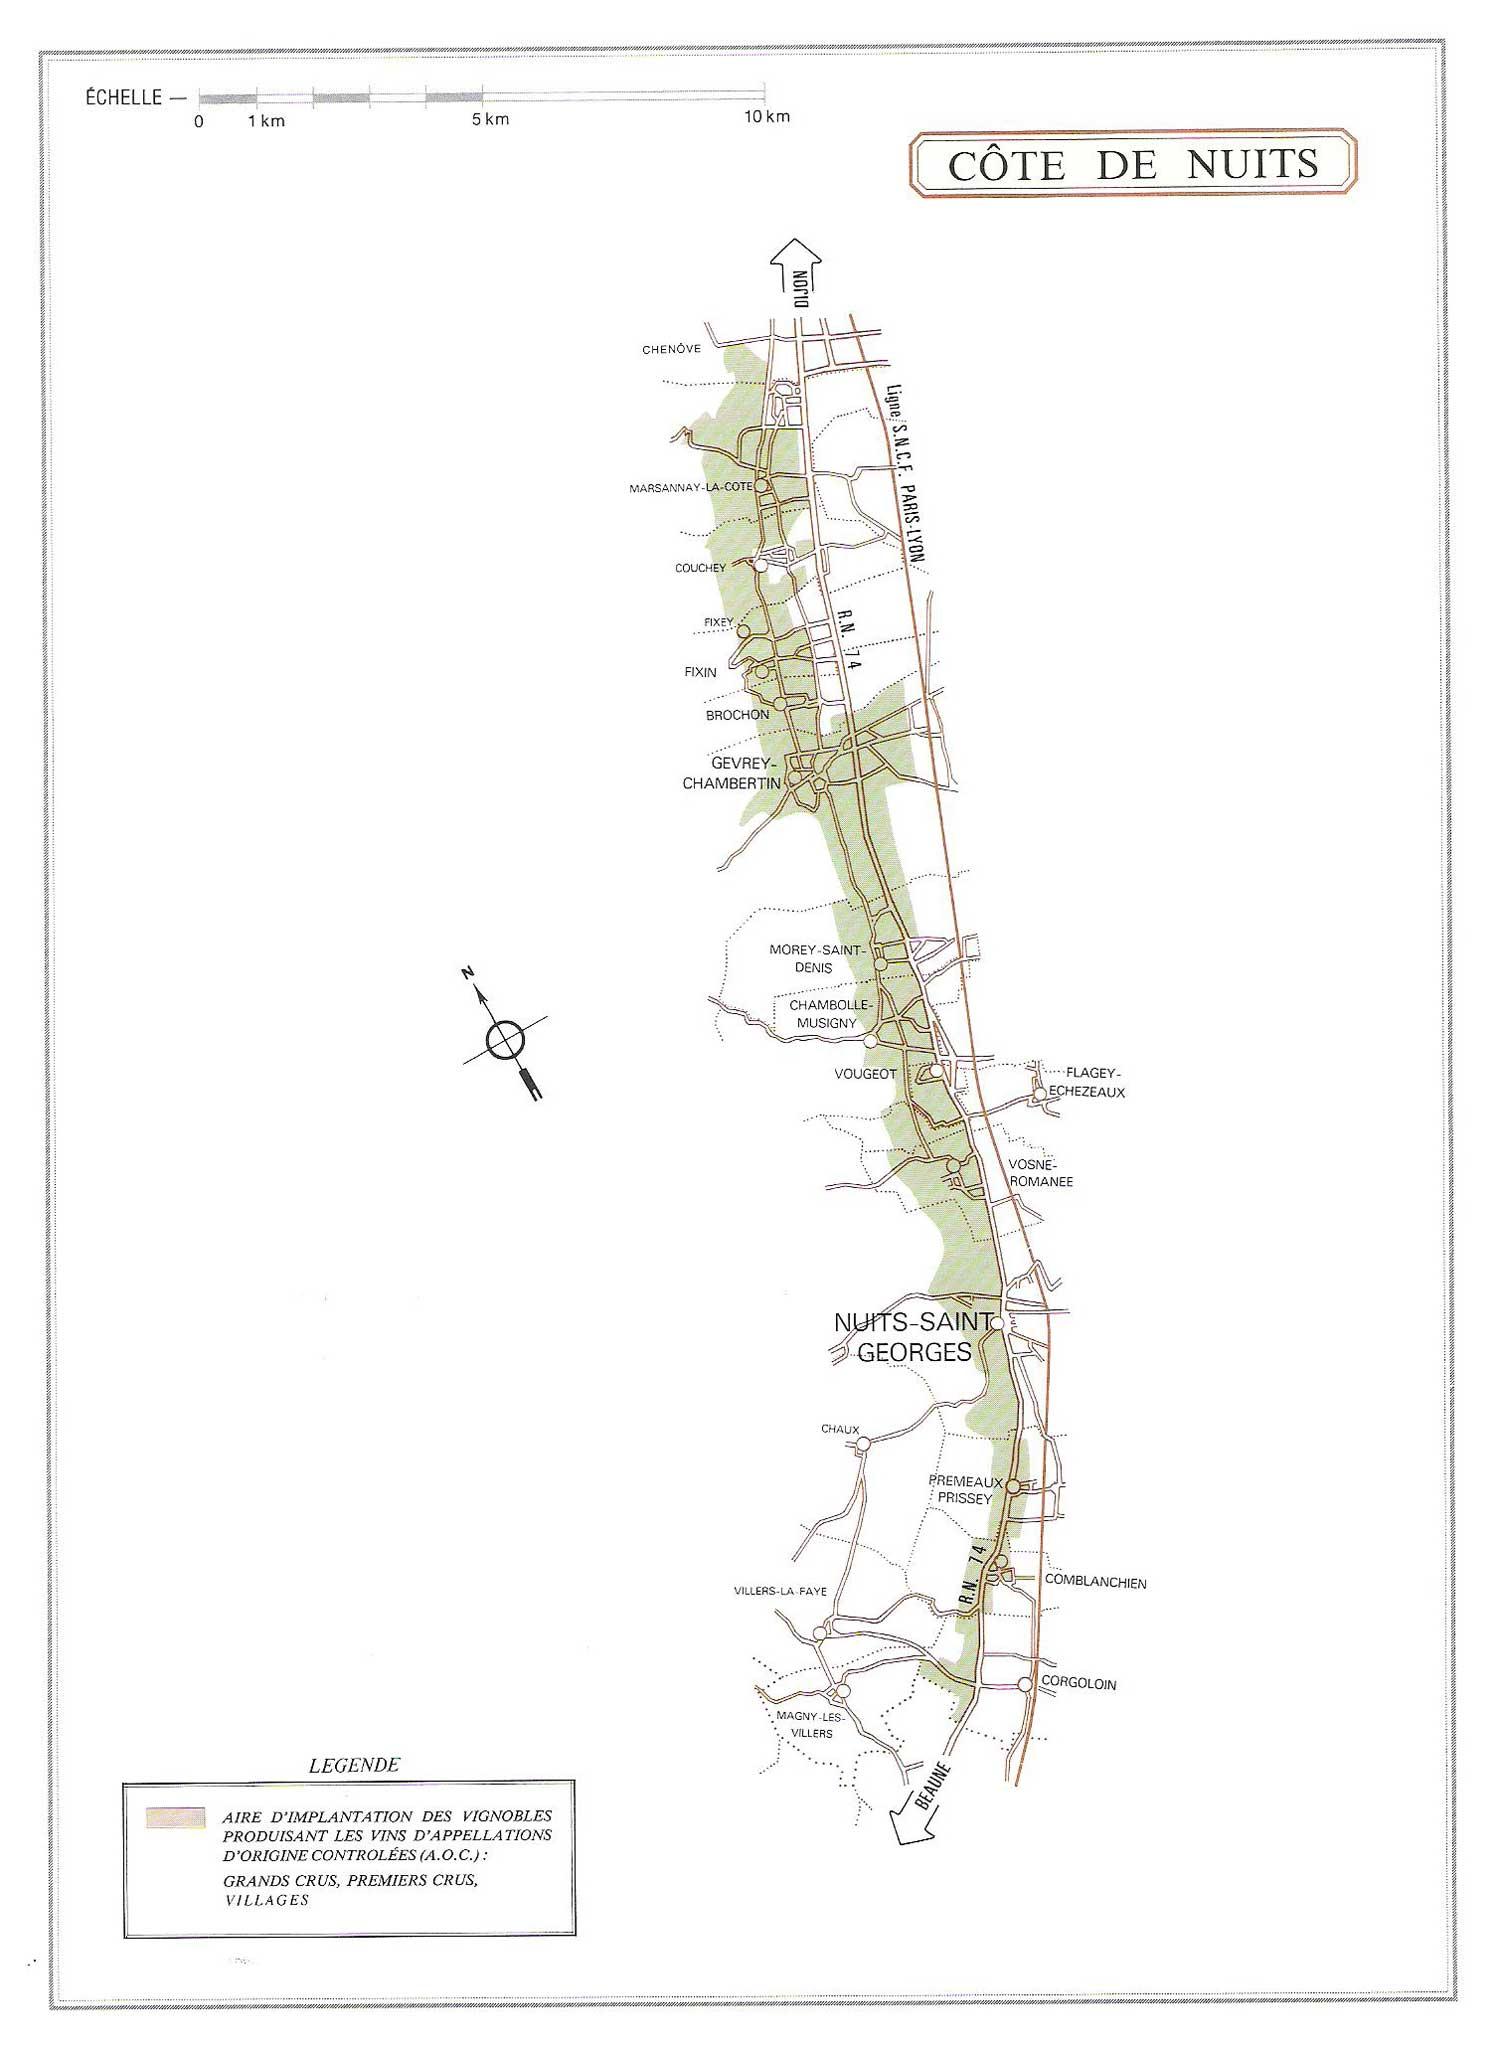 Picture of Cote de Nuits Vineyard Map